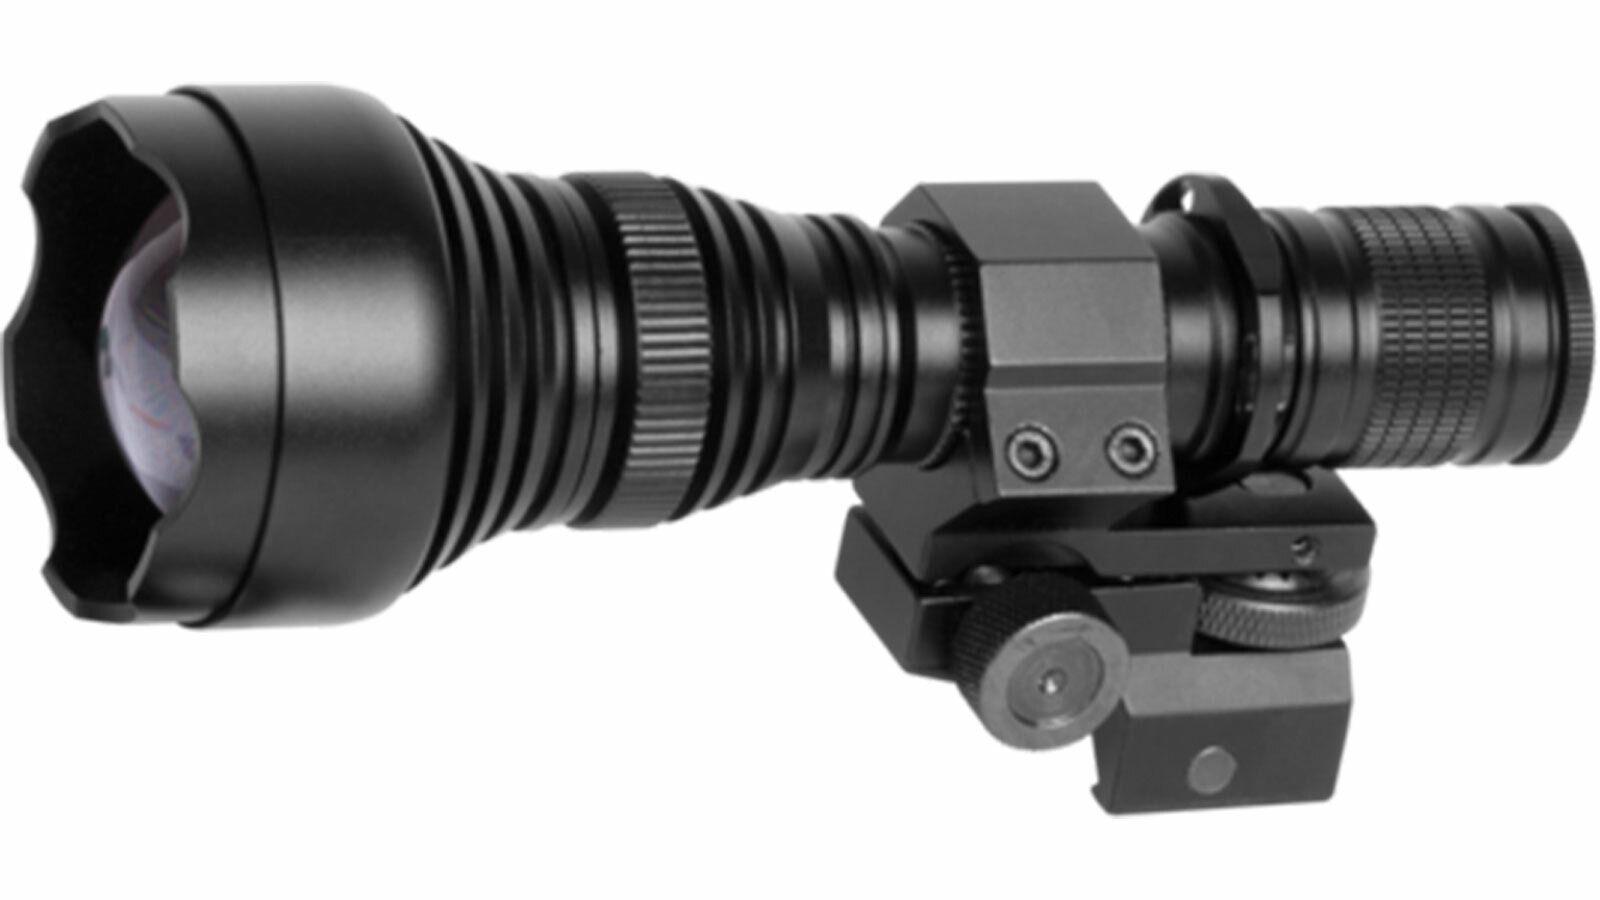 nuevo  ATN IR850 PRO largo alcance ir mal acmuir 85PR